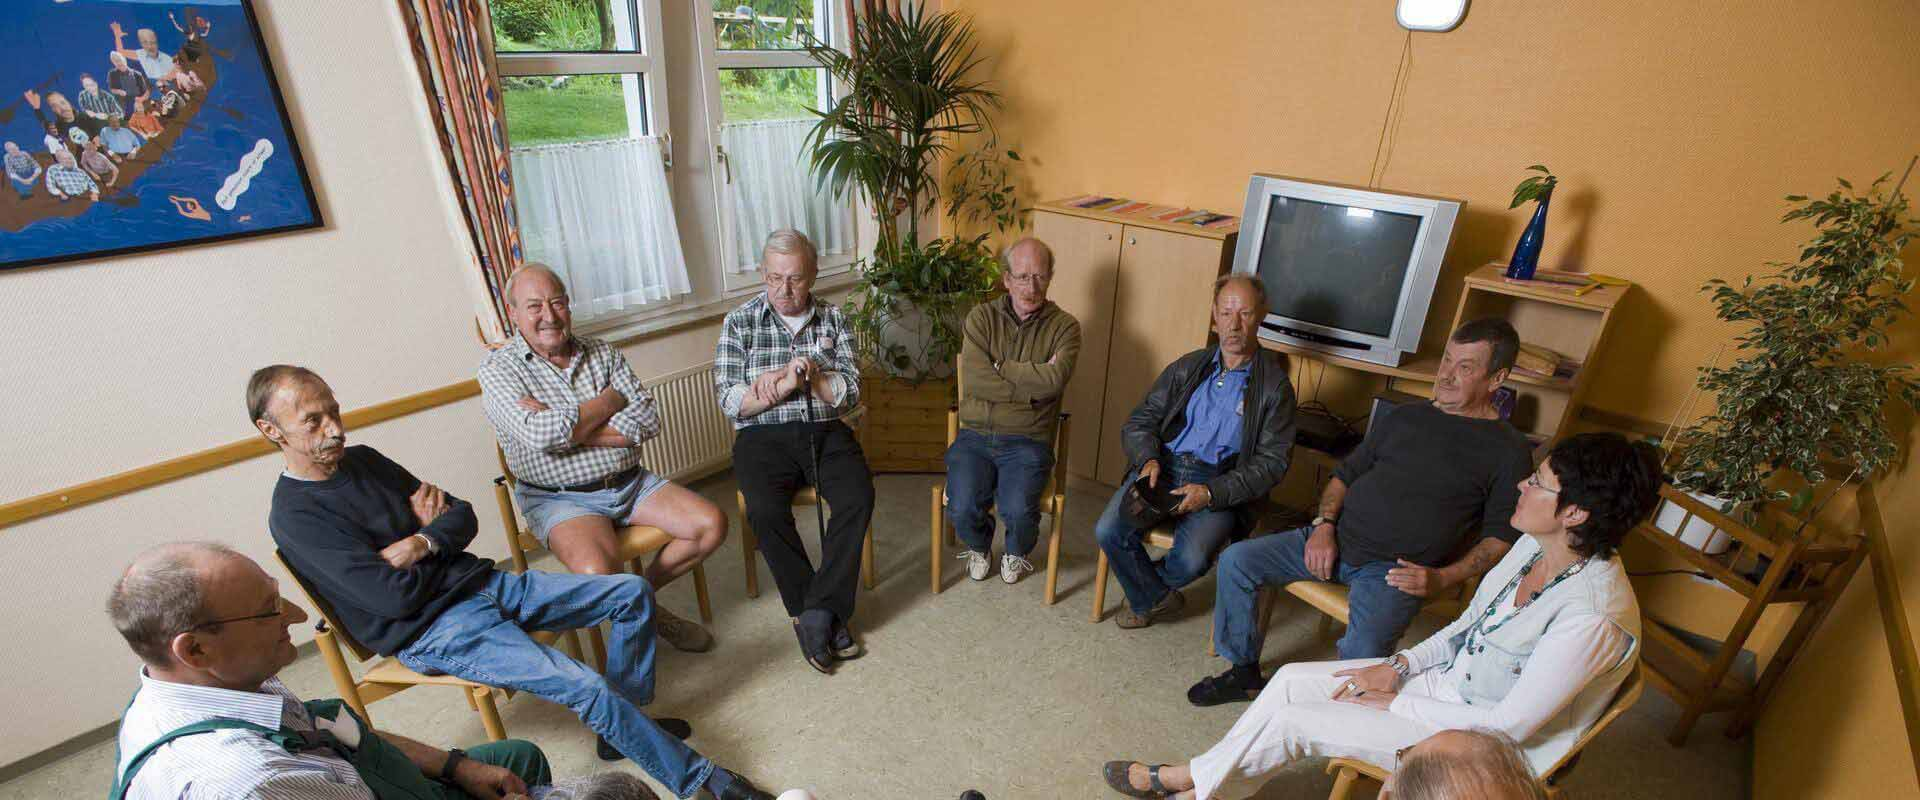 Gruppentherapie im MEDIAN Therapiezentrum Bassenheim